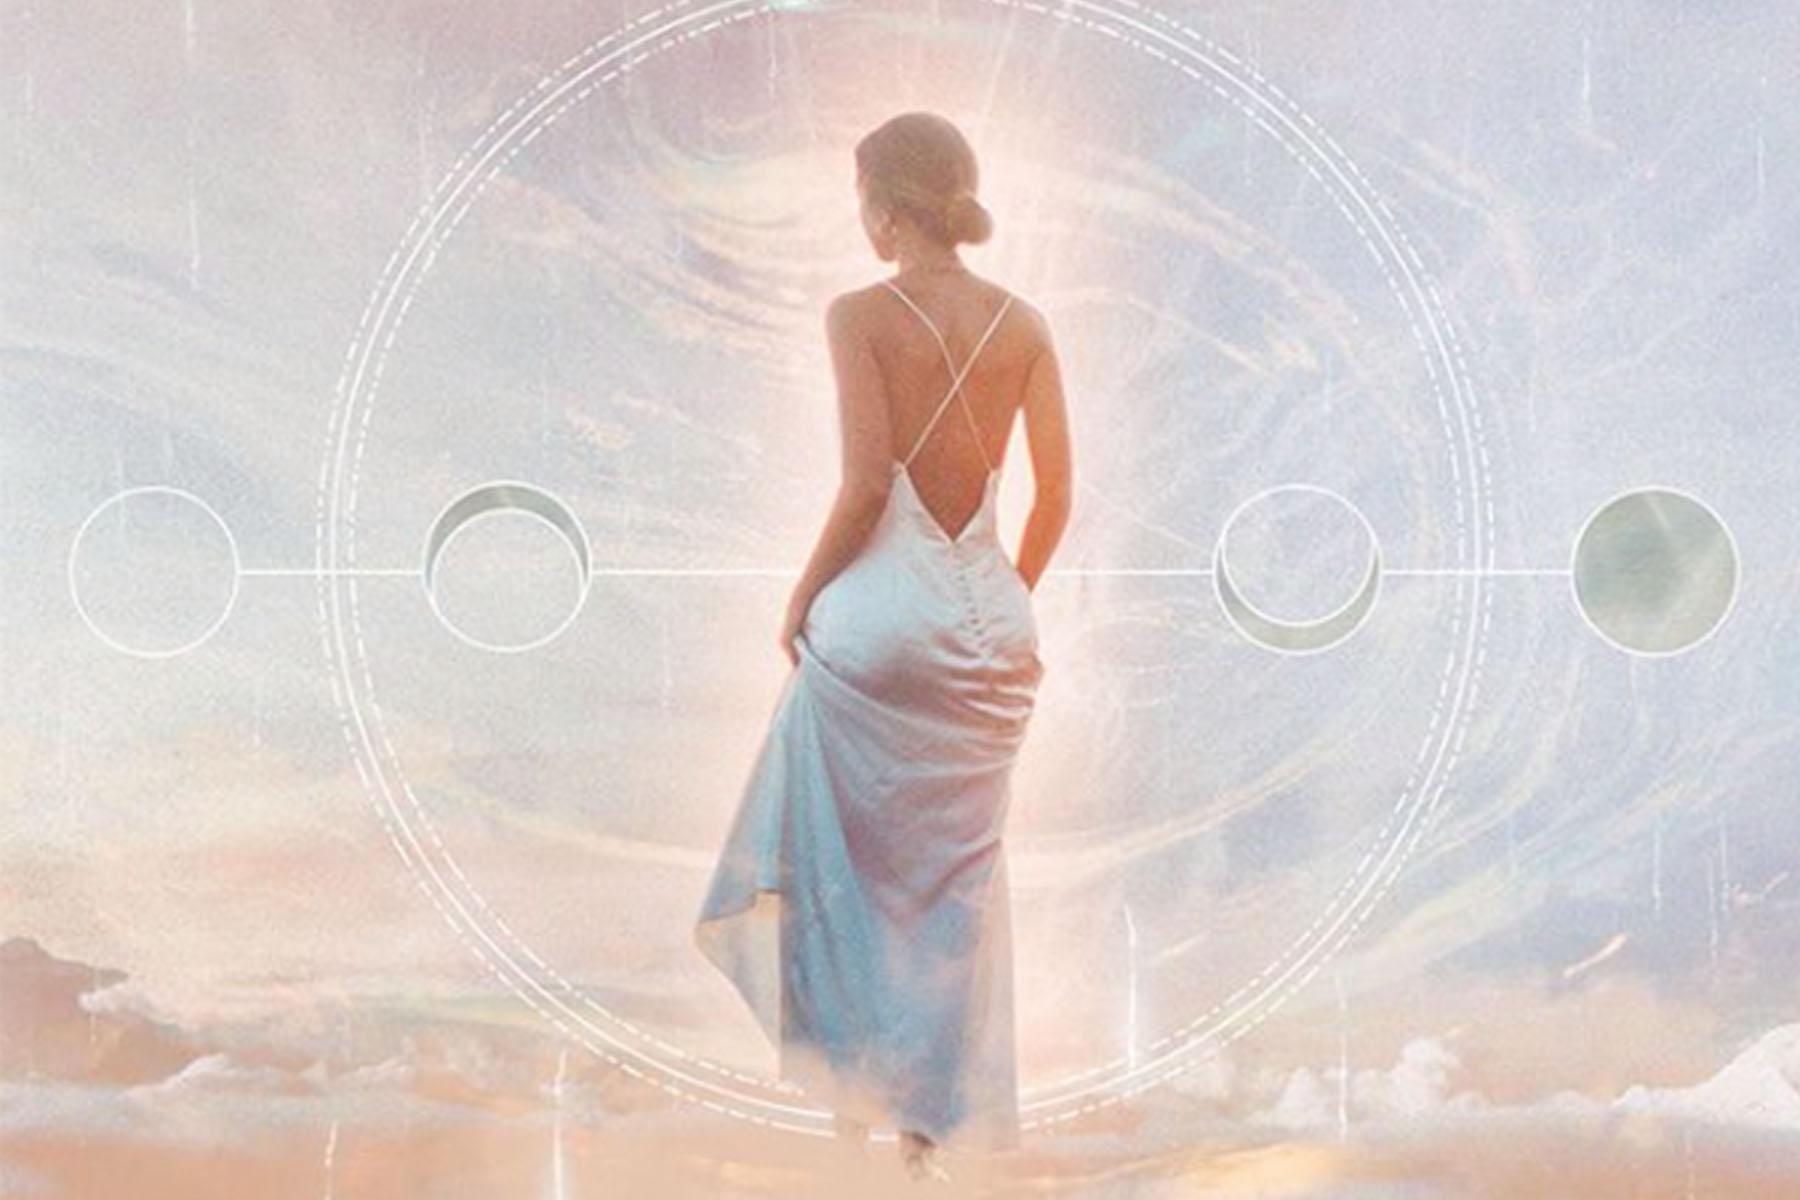 Weekly Horoscope: Eclipse Season Has Arrived